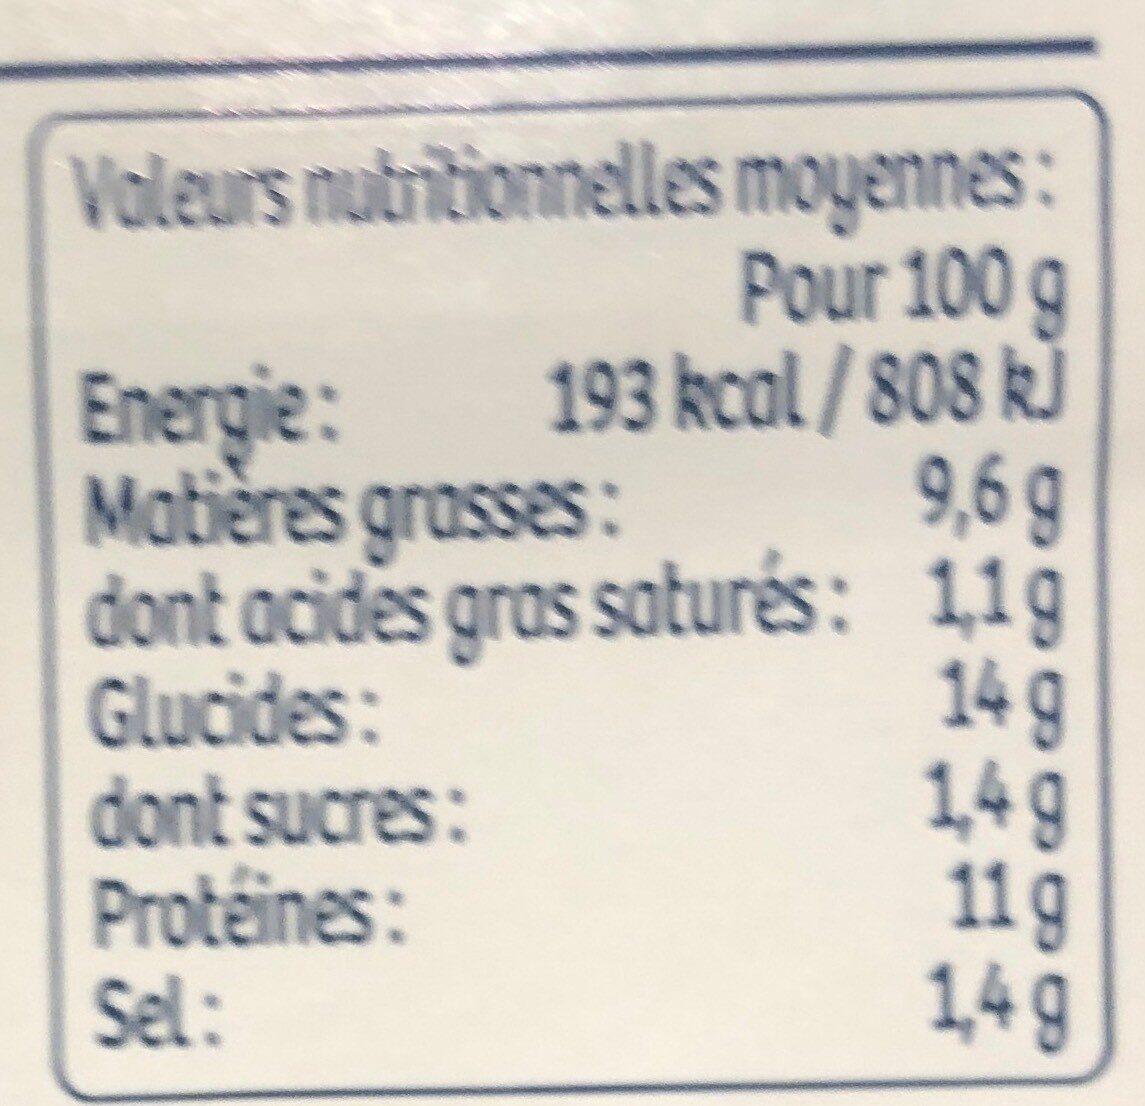 Barquette 200g acras crevettes - Voedingswaarden - fr